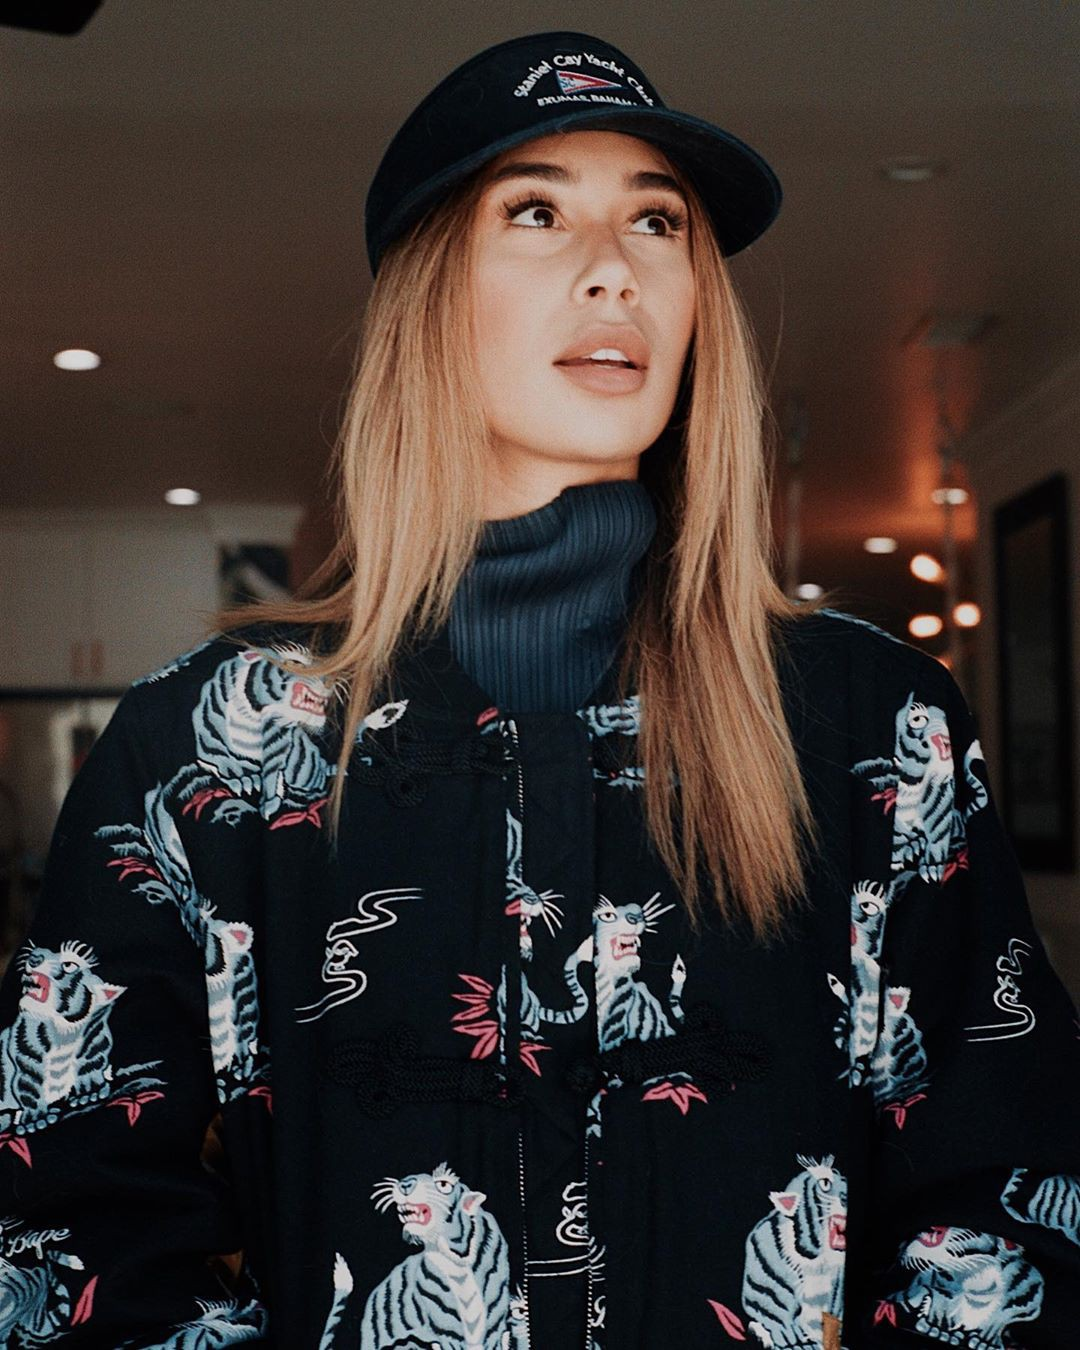 Eva Gutowski t-shirt colour outfit, beautiful girls pictures, Cool Attitude Girls